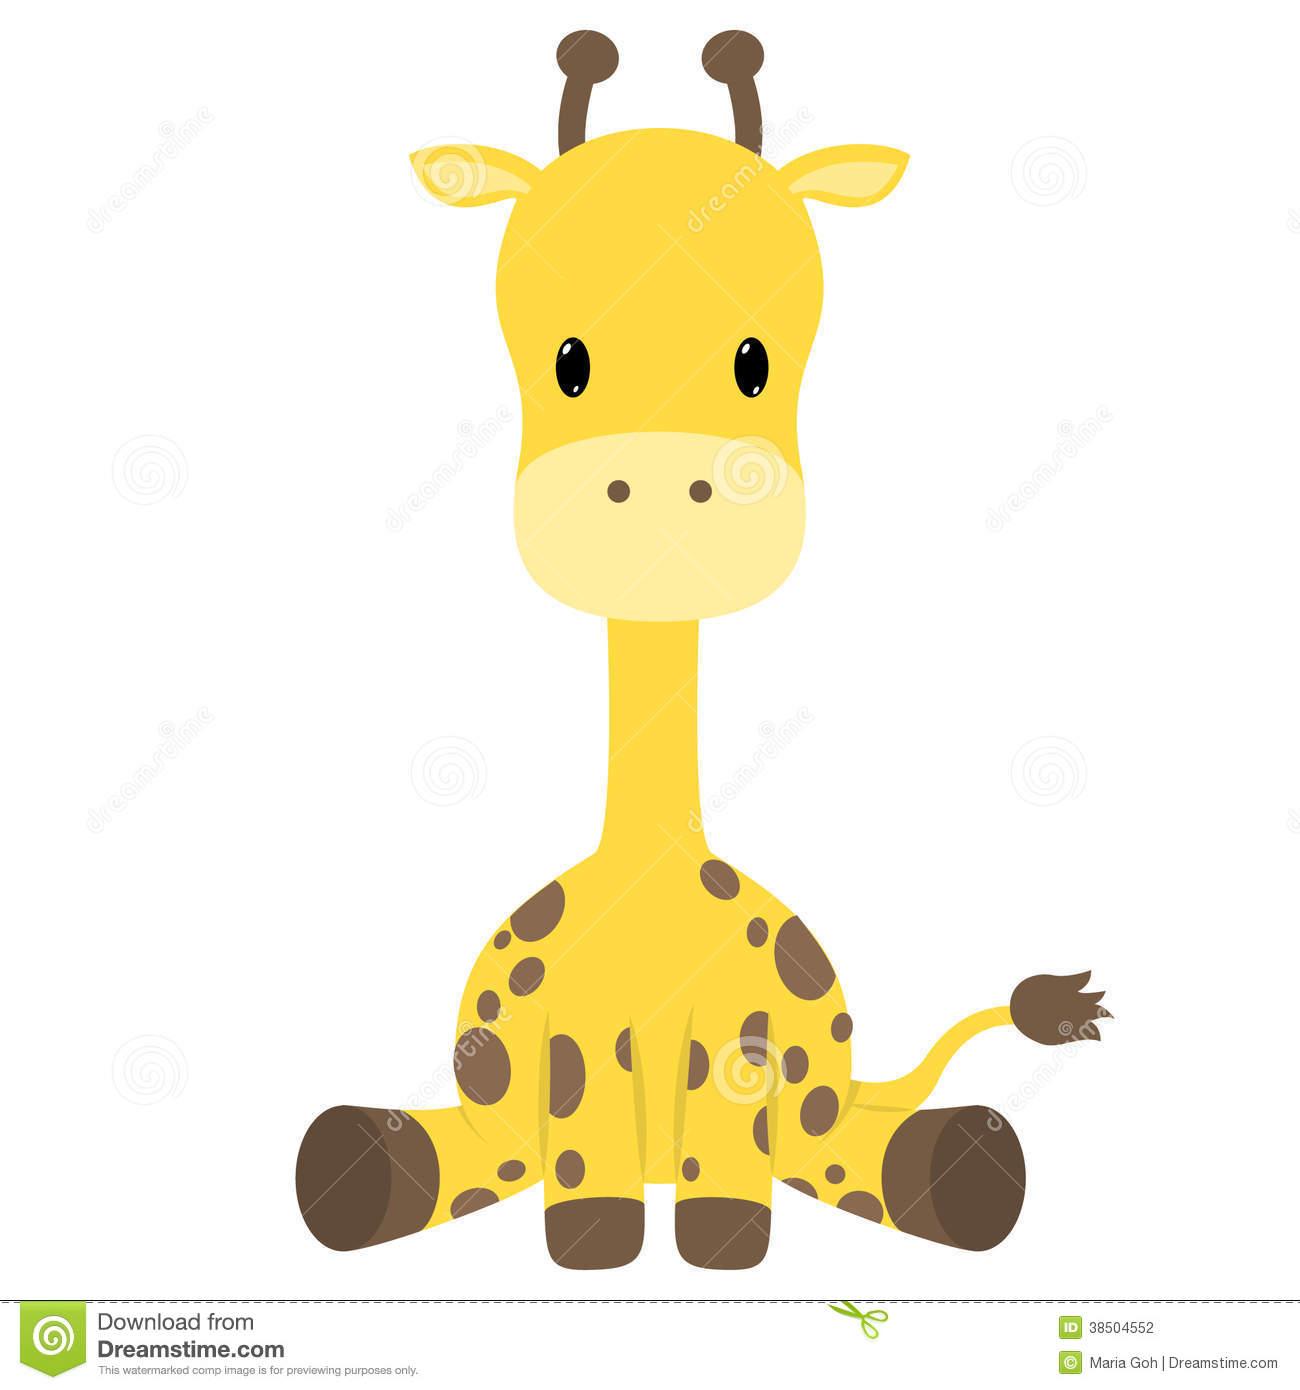 Baby shower giraffe clip art clip art Giraffe Baby Shower Clipart - Clipart Kid clip art